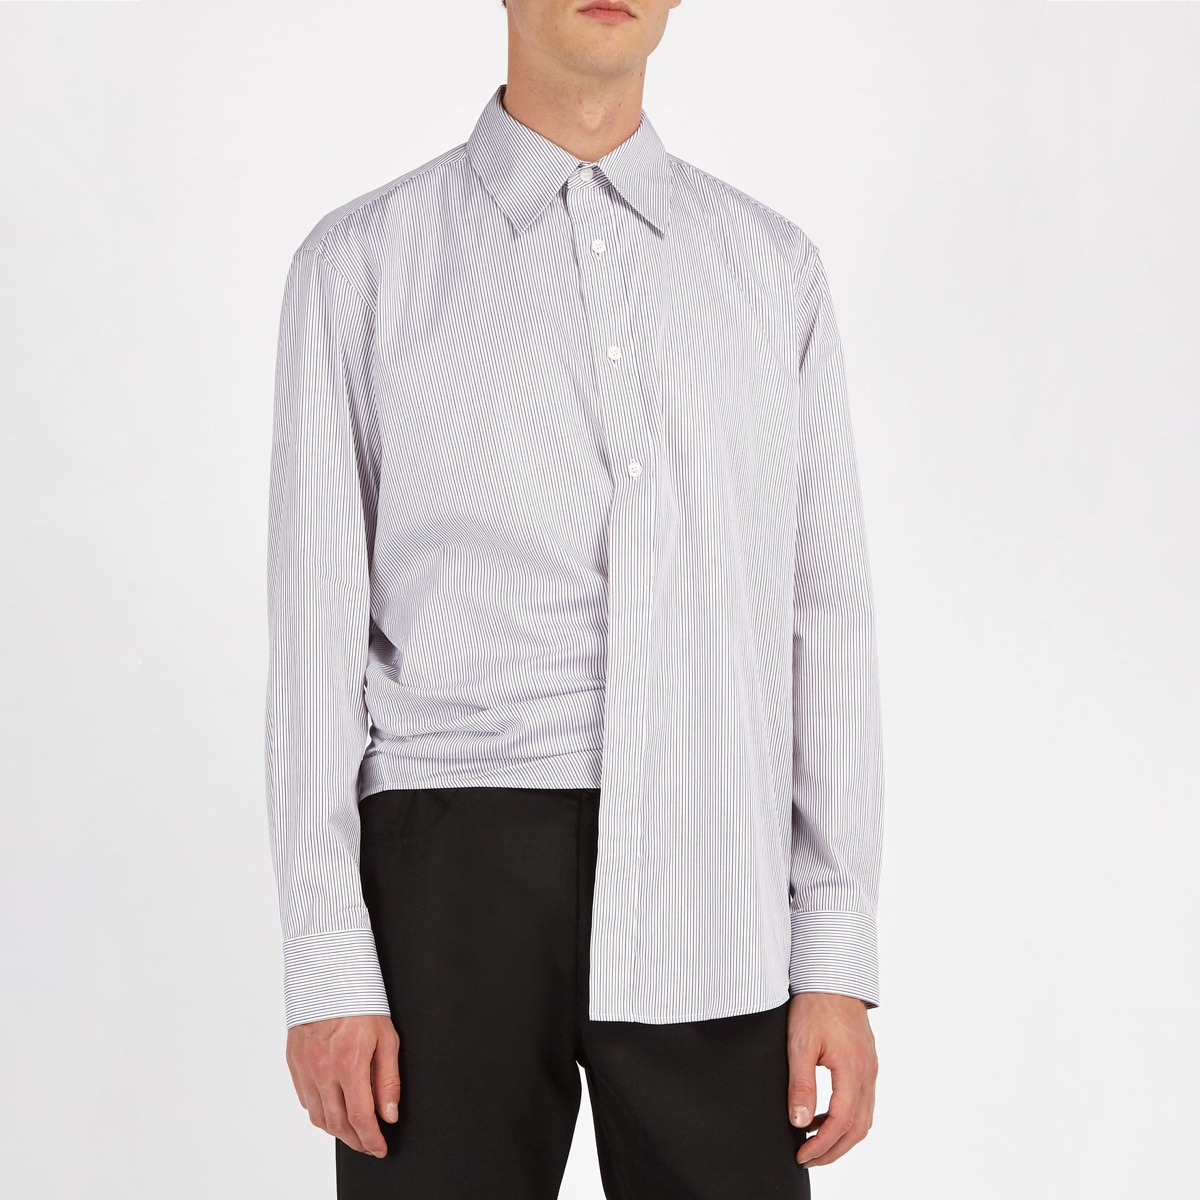 Martine Rose Wrap Shirt f2.jpg